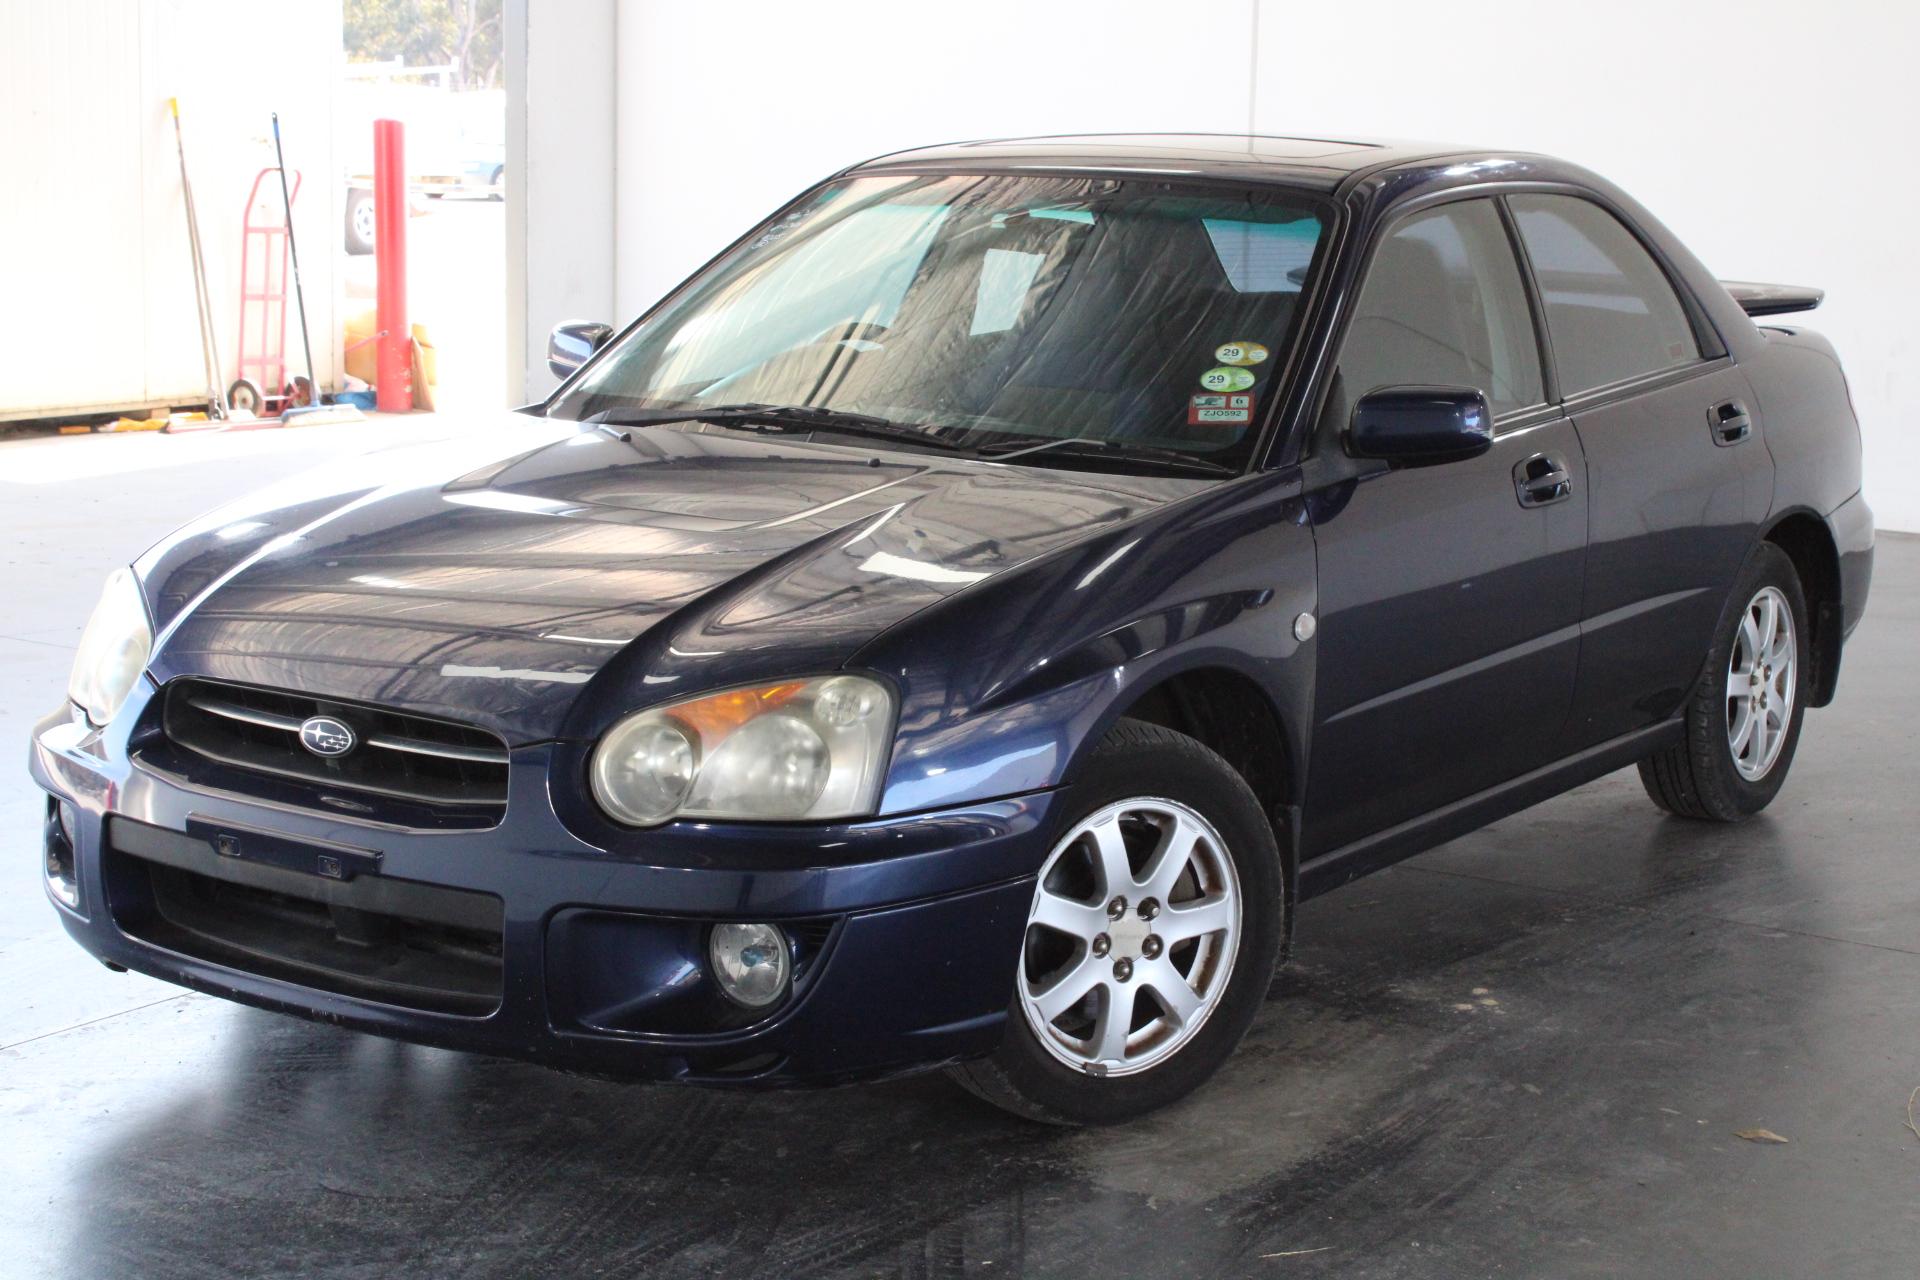 2005 Subaru Impreza GX (AWD) G2 Automatic Sedan